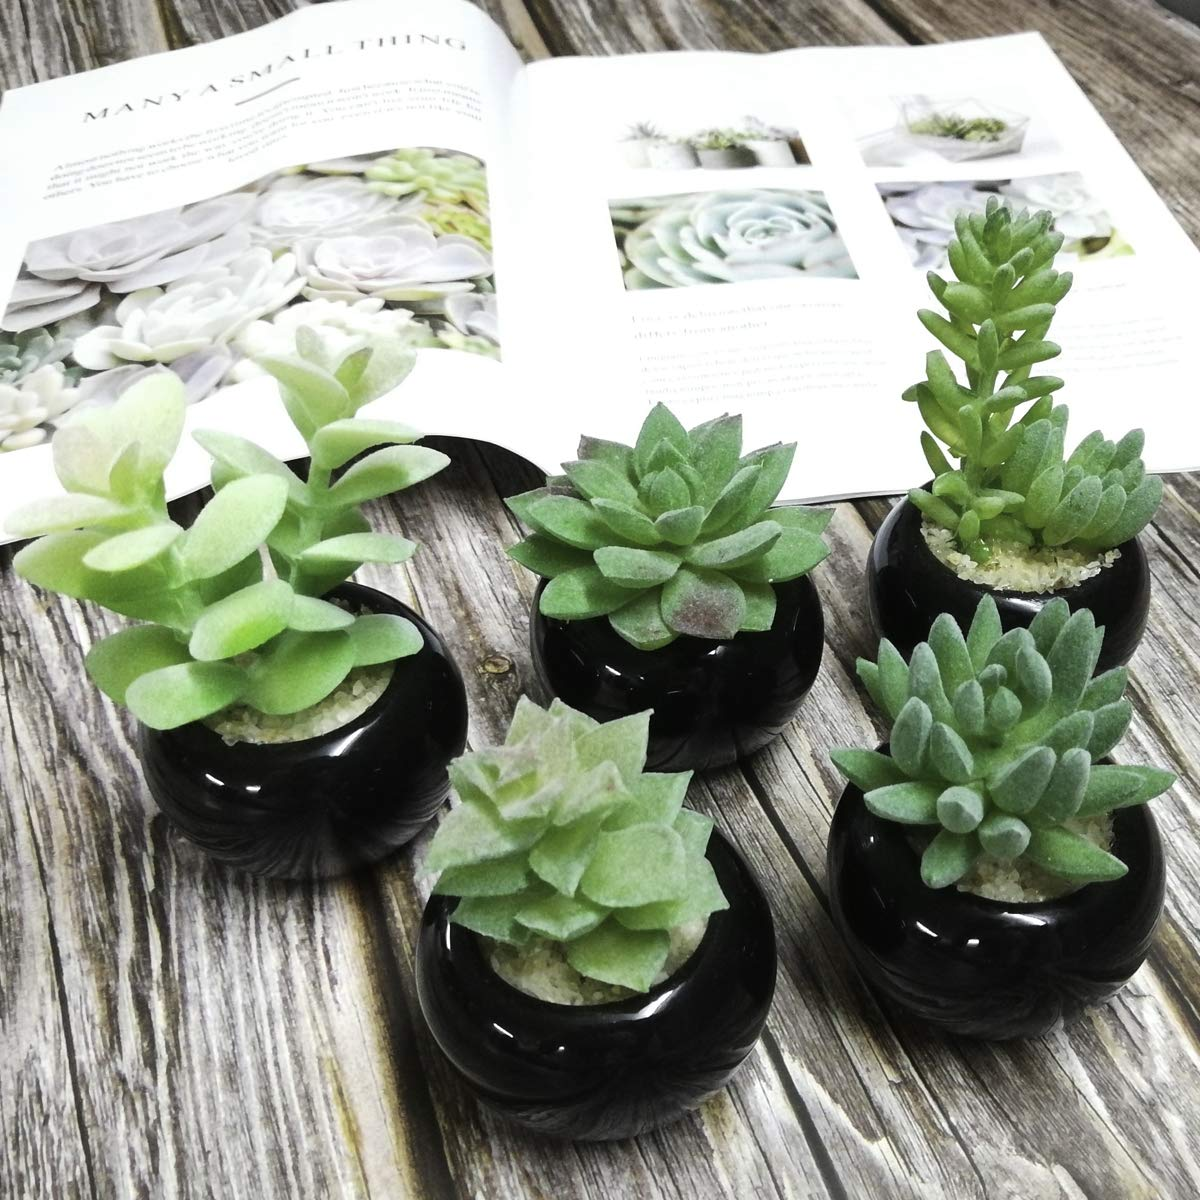 Faux Greenery 2 pcs Set 3.5 x 6.7(D x H) Tuokor Small Artificial Plants in Ceramic Pots